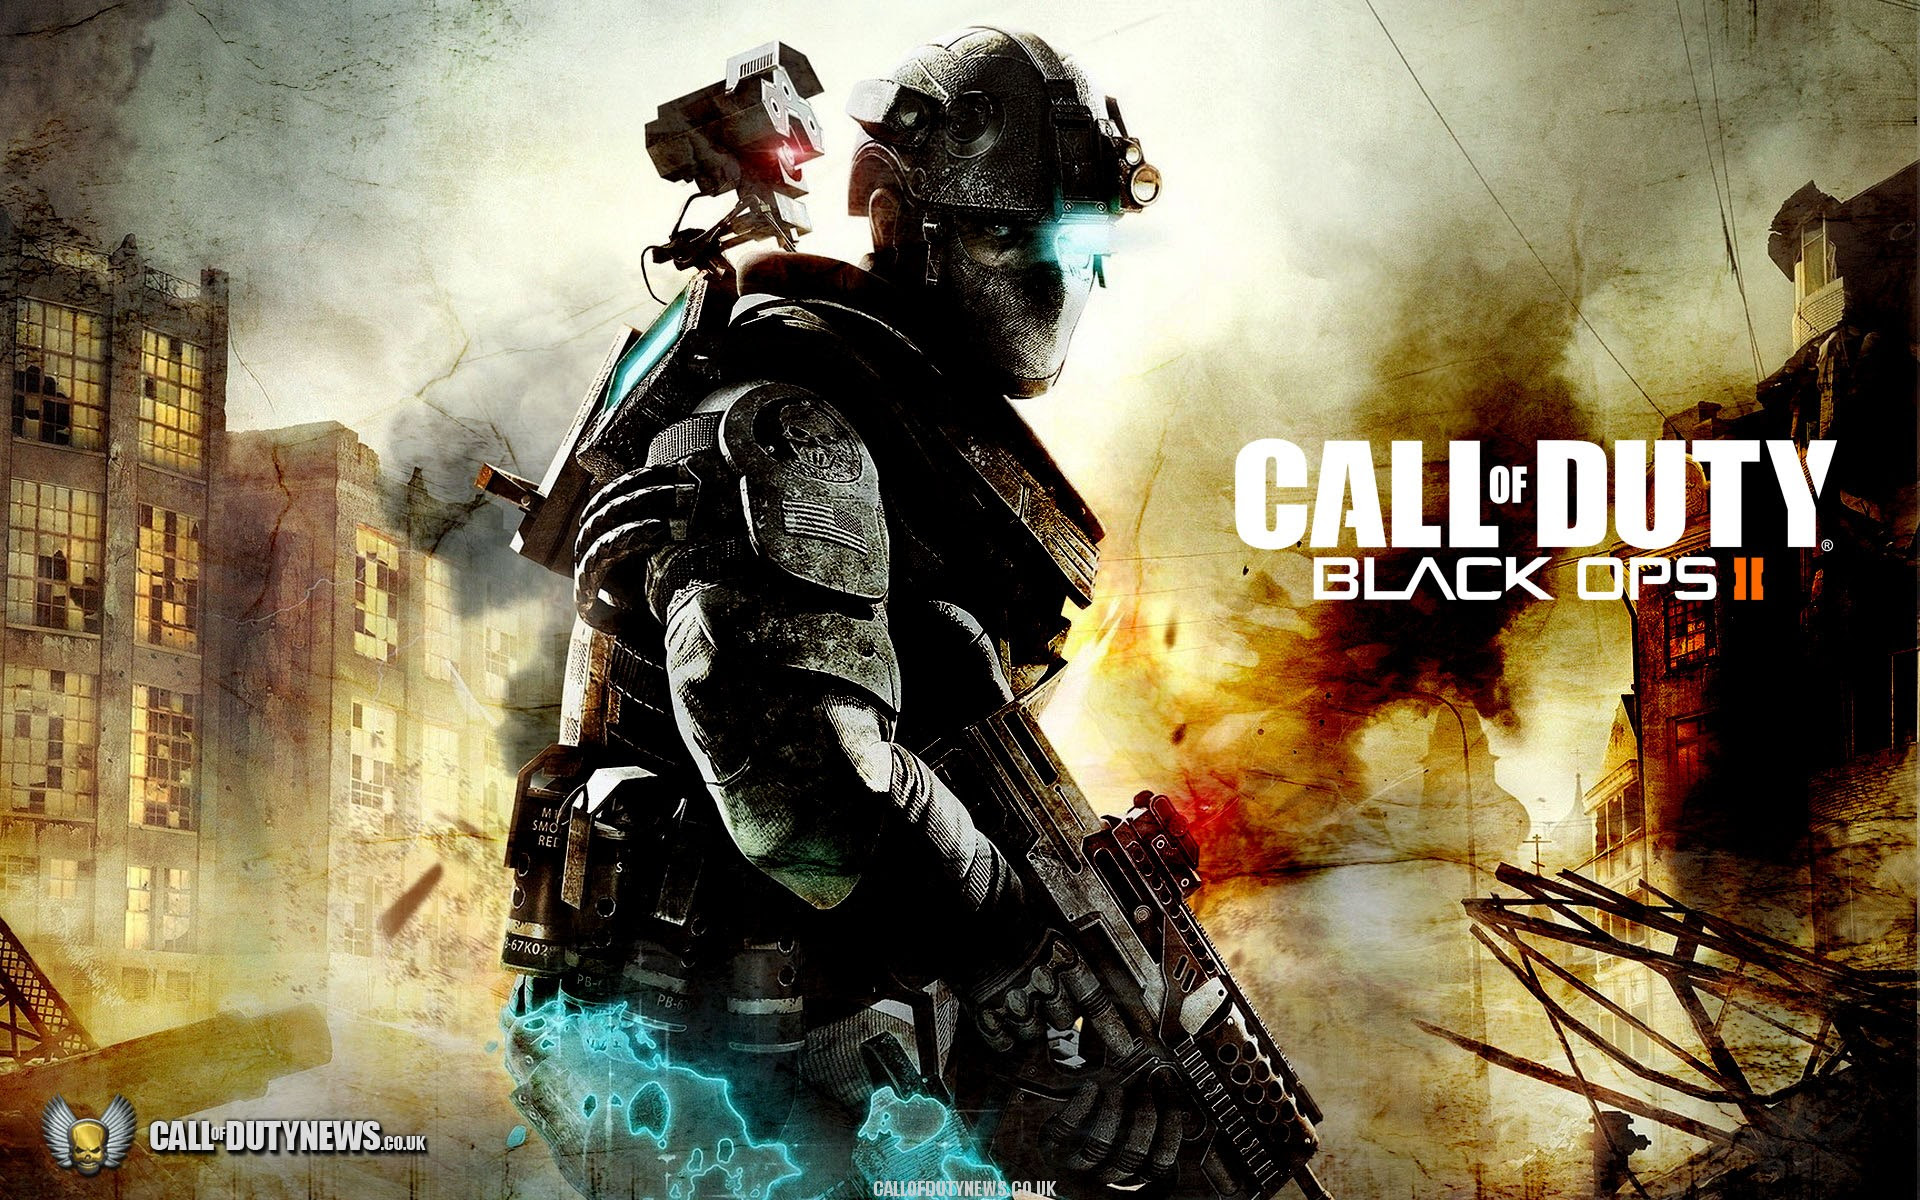 Call Of Duty Black Ops 2 Wallpaper 1920x1200 67340